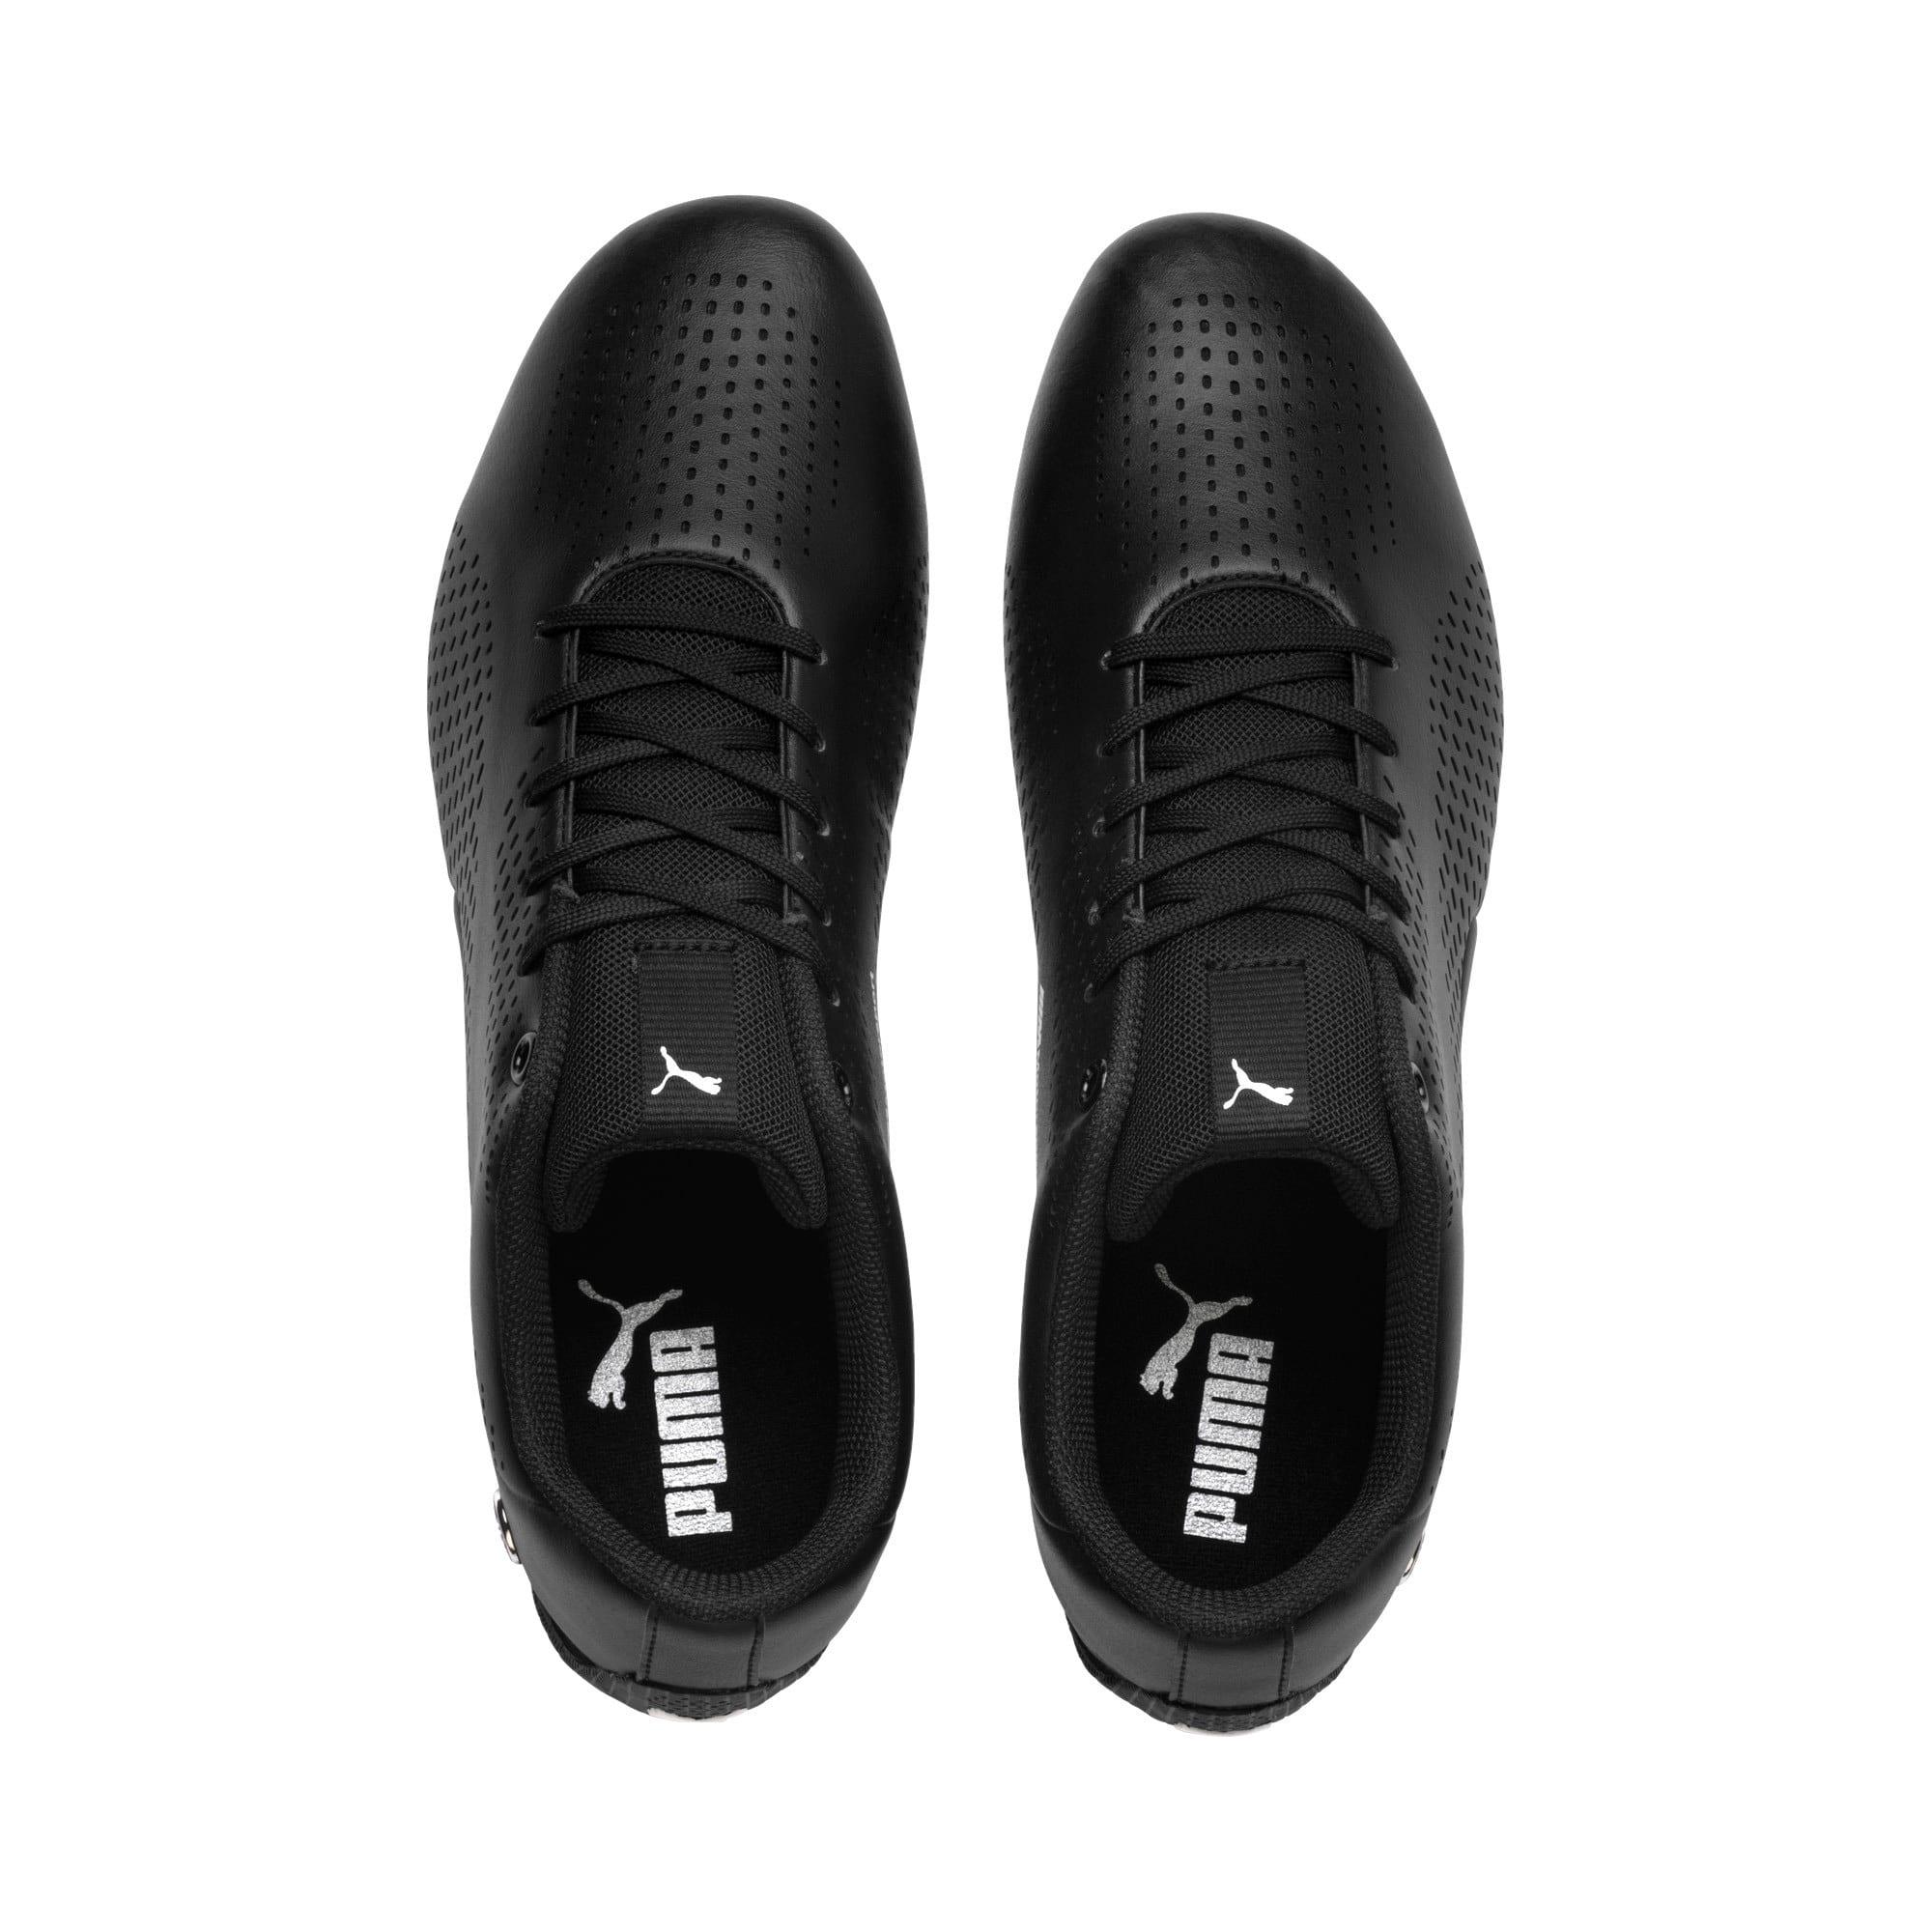 Thumbnail 6 of BMW M Motorsport Drift Cat 5 Ultra II Men's Shoes, Puma Black-Puma Black, medium